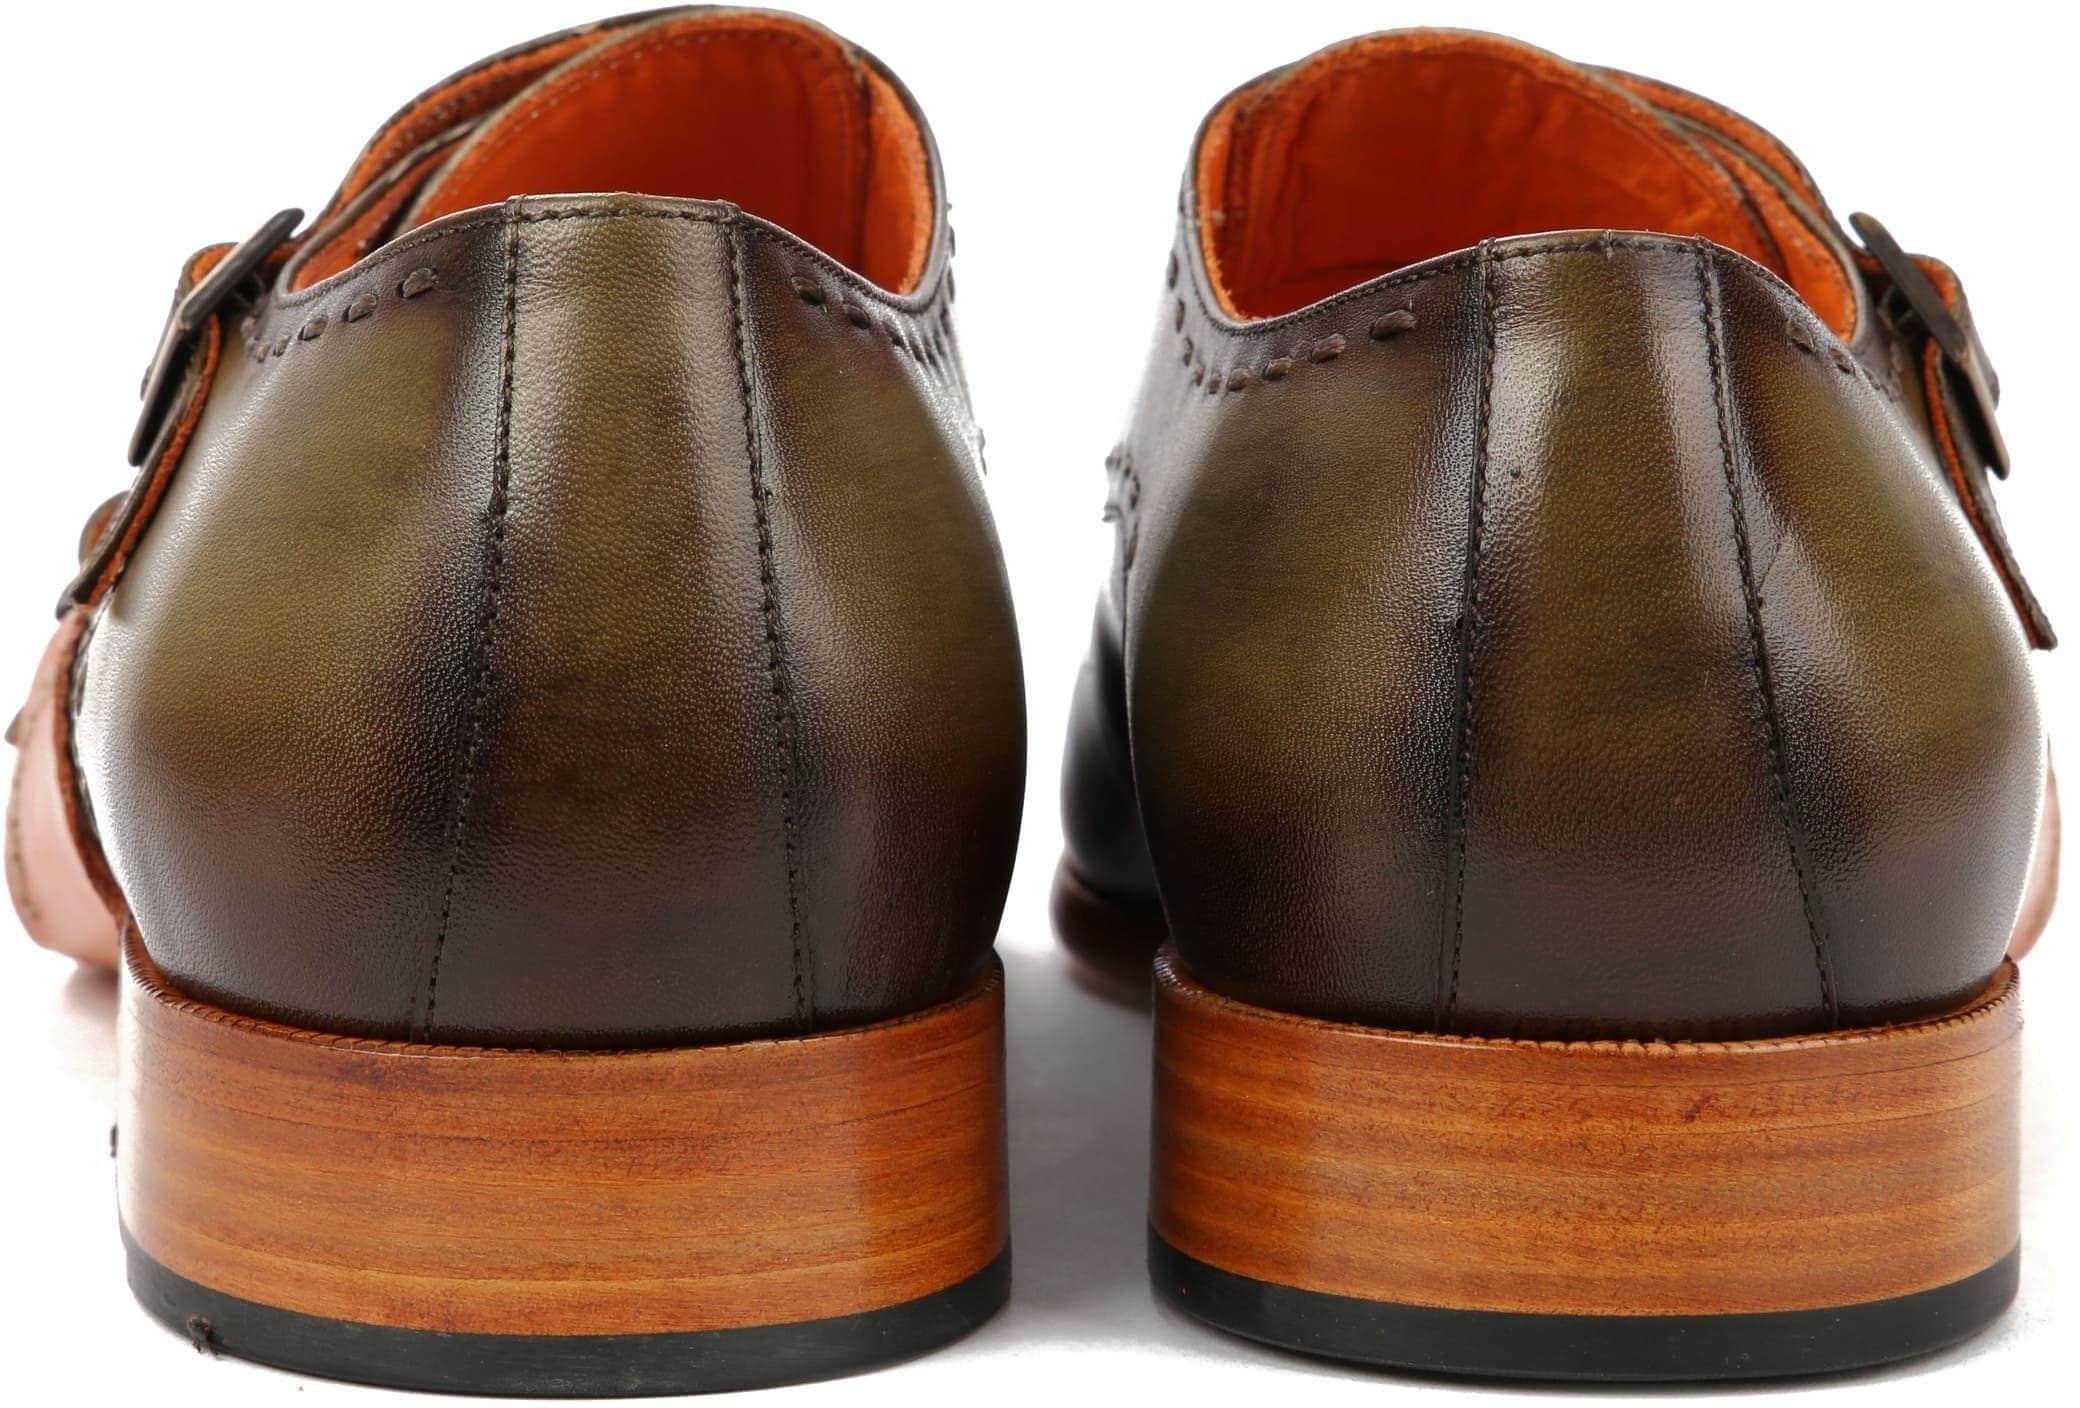 Melik Double Monk Strap Shoe Drago Green foto 3